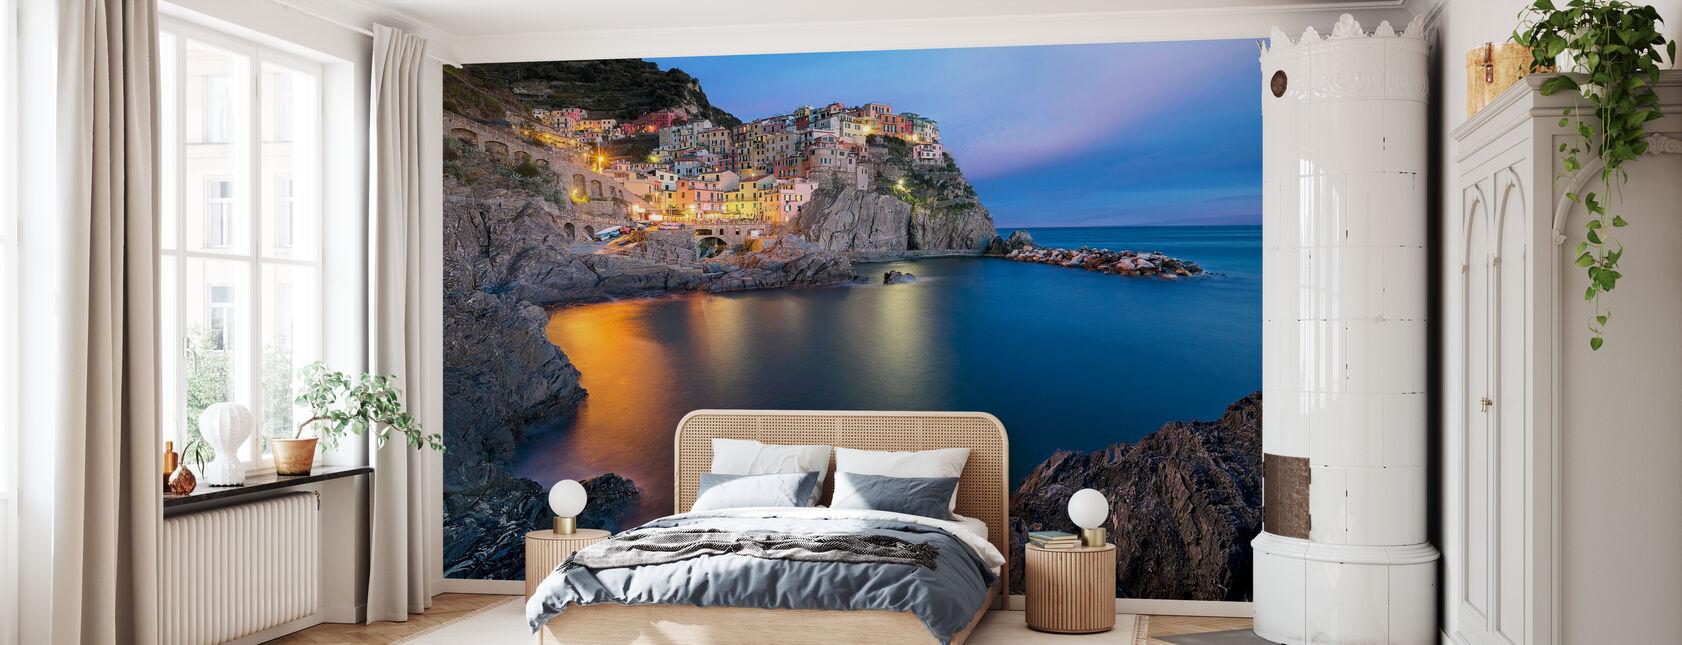 Manarola Lifestyle - Wallpaper - Bedroom